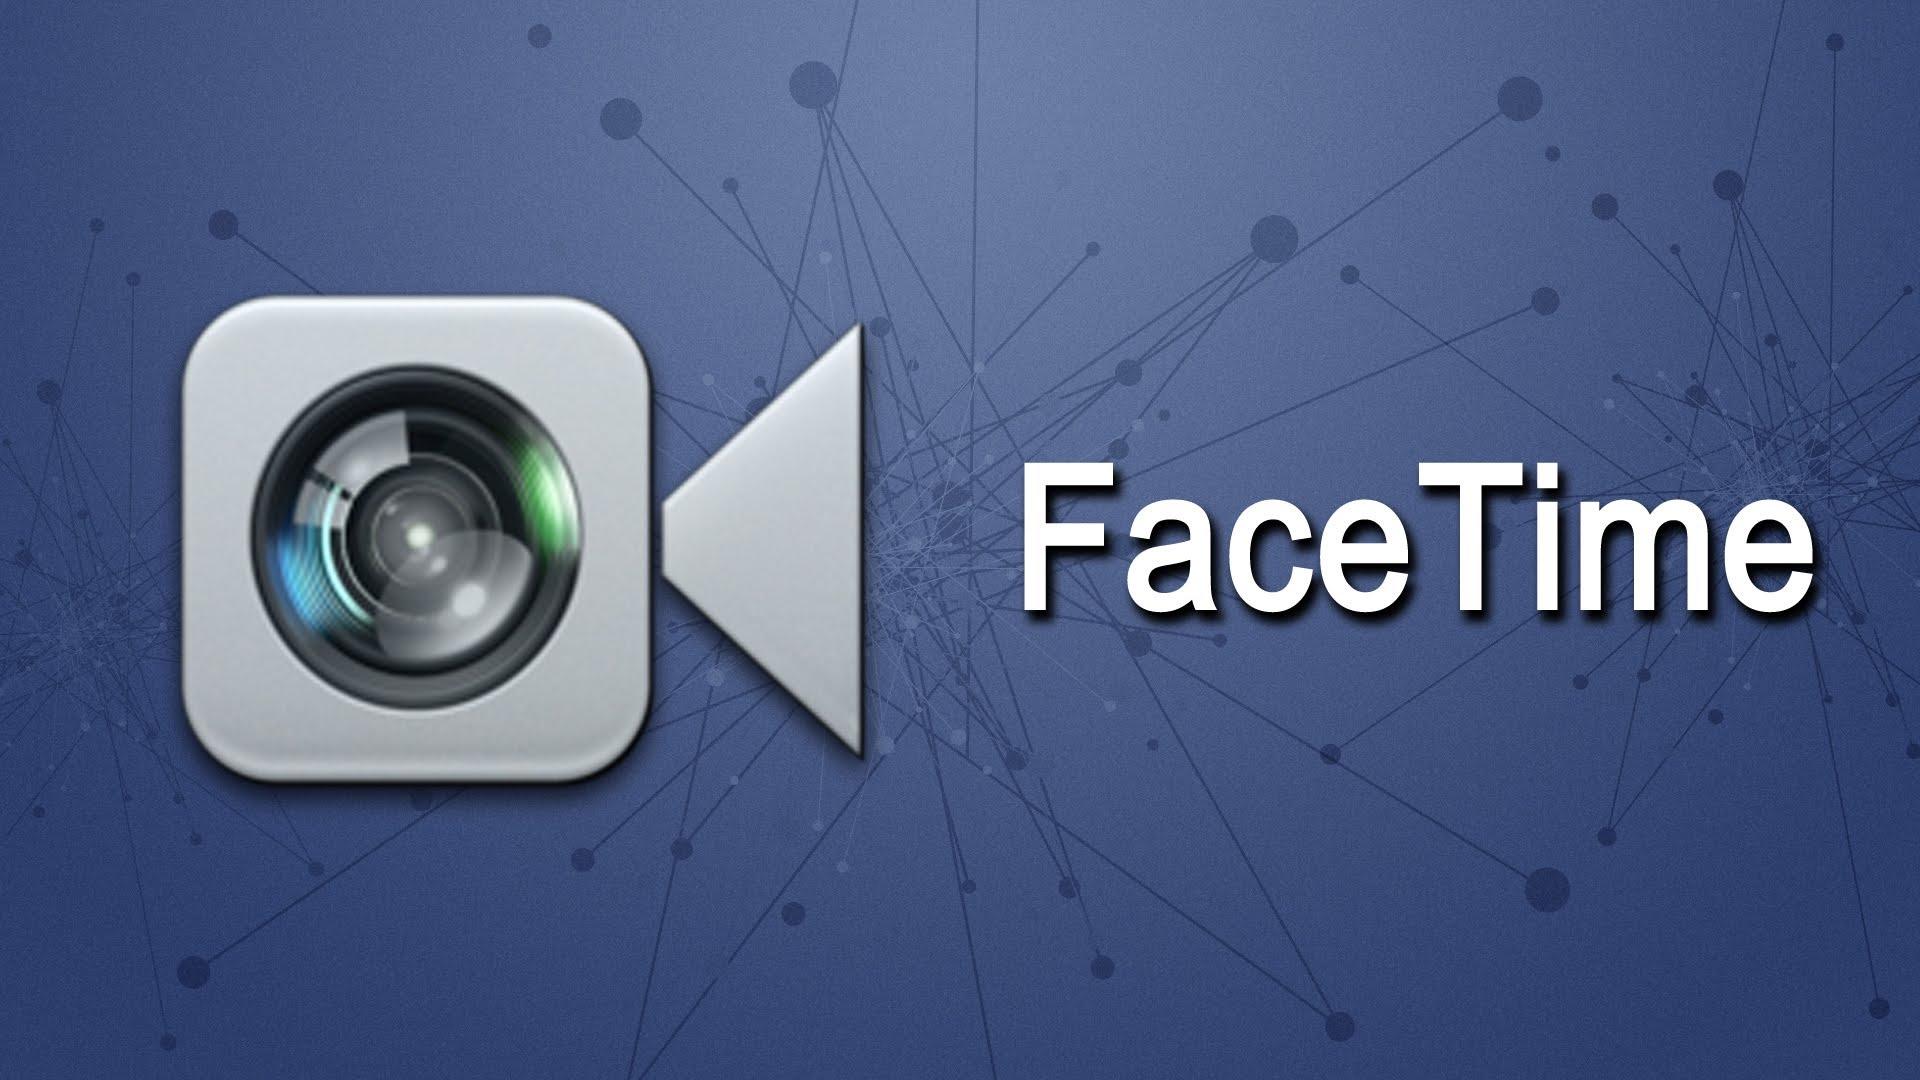 Facetime for Windows PC 10/8.1/8/7